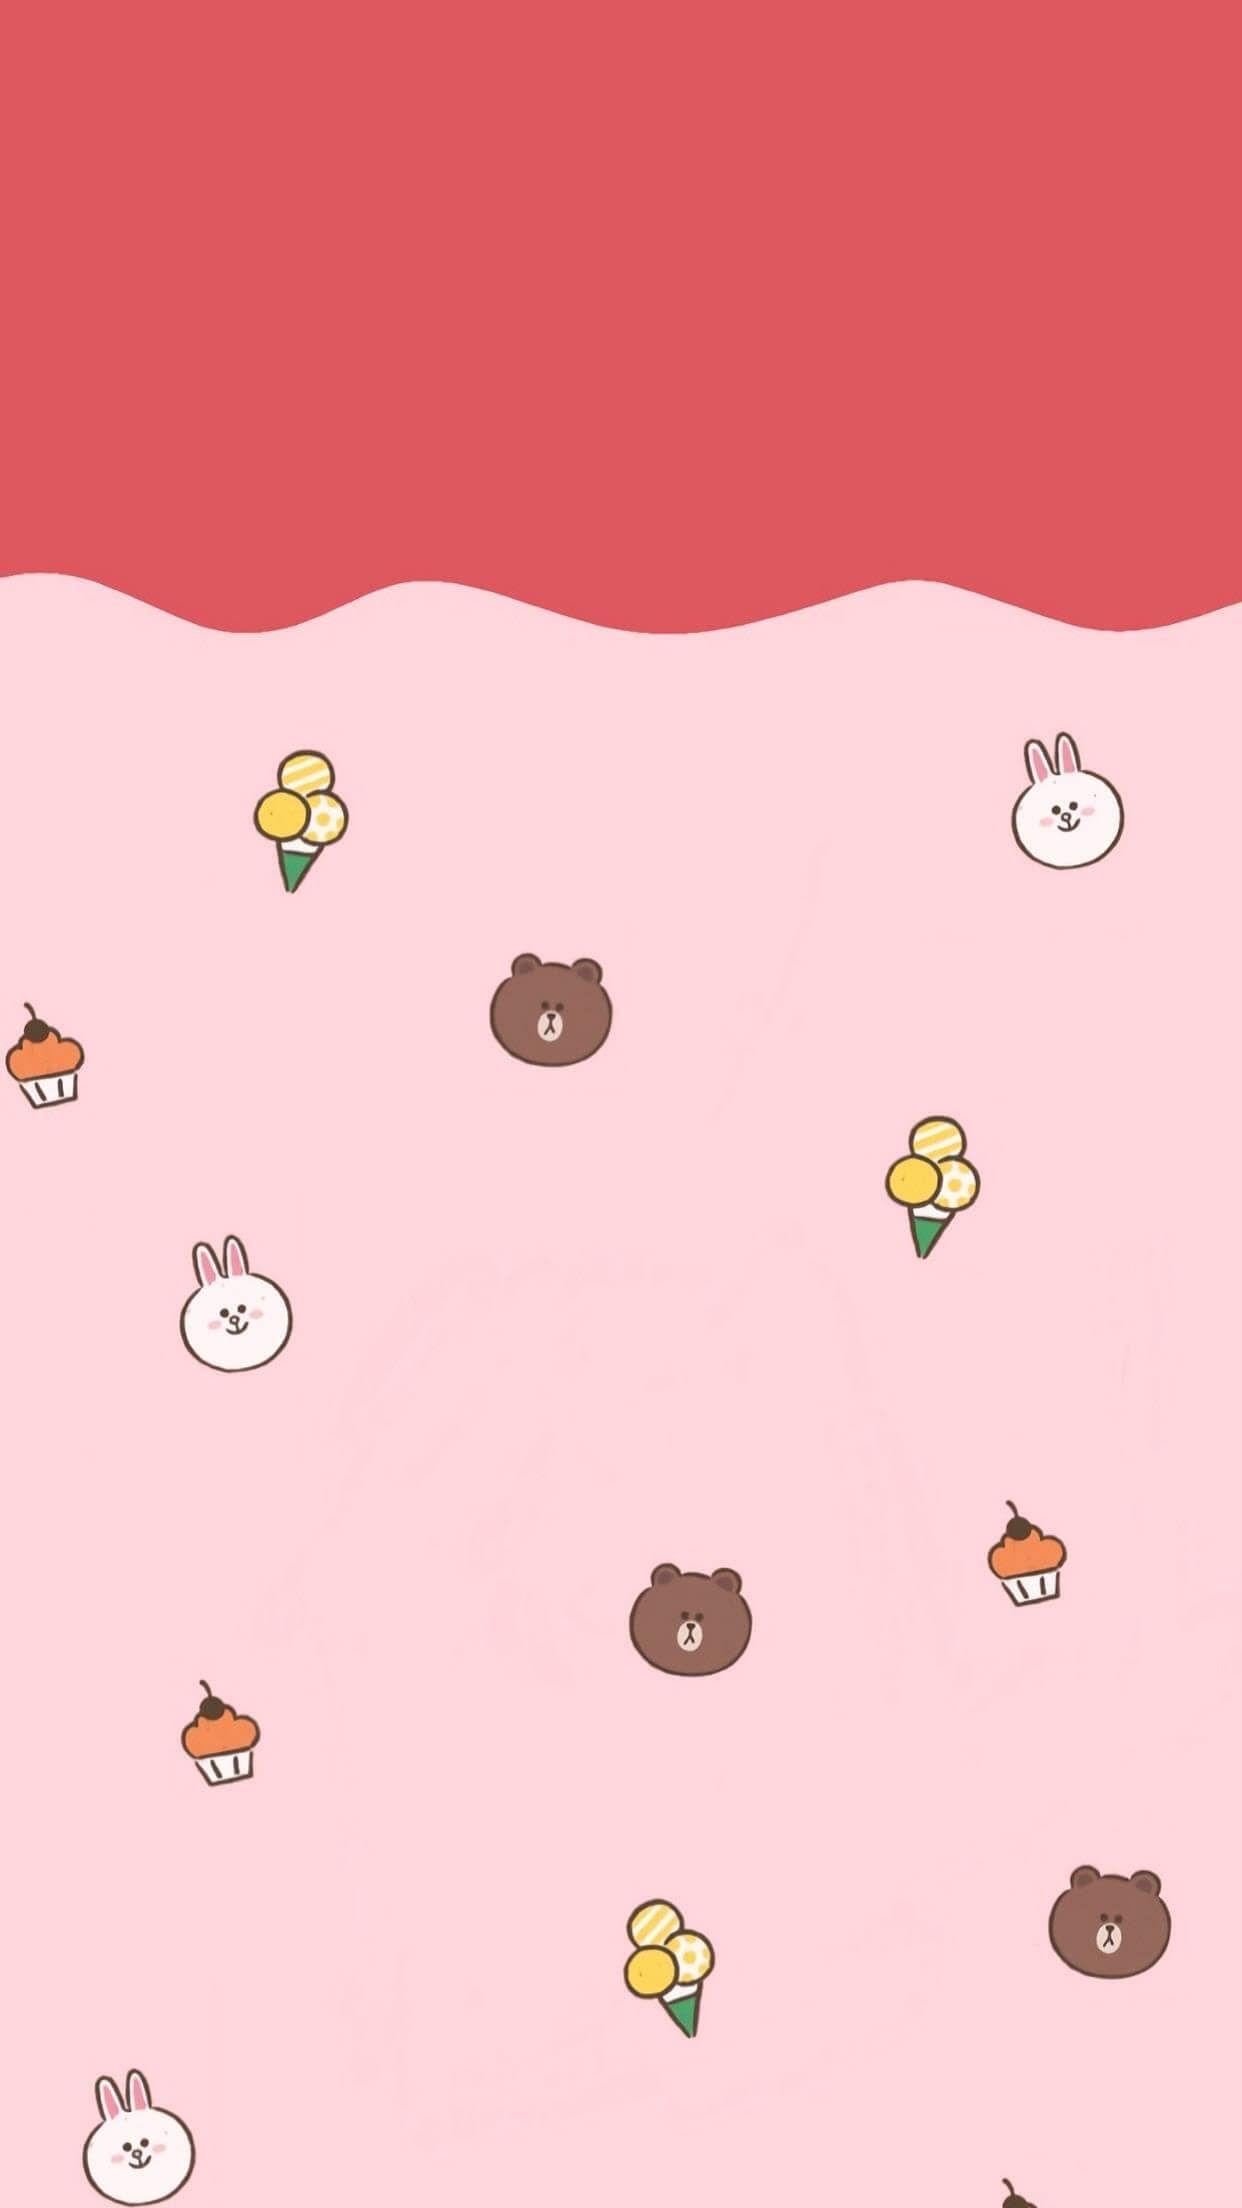 30 Cute Free Hd Phone Wallpaper You Will Love Ideasdonuts Cute Mobile Wallpapers Hd Phone Wallpapers Cute Patterns Wallpaper